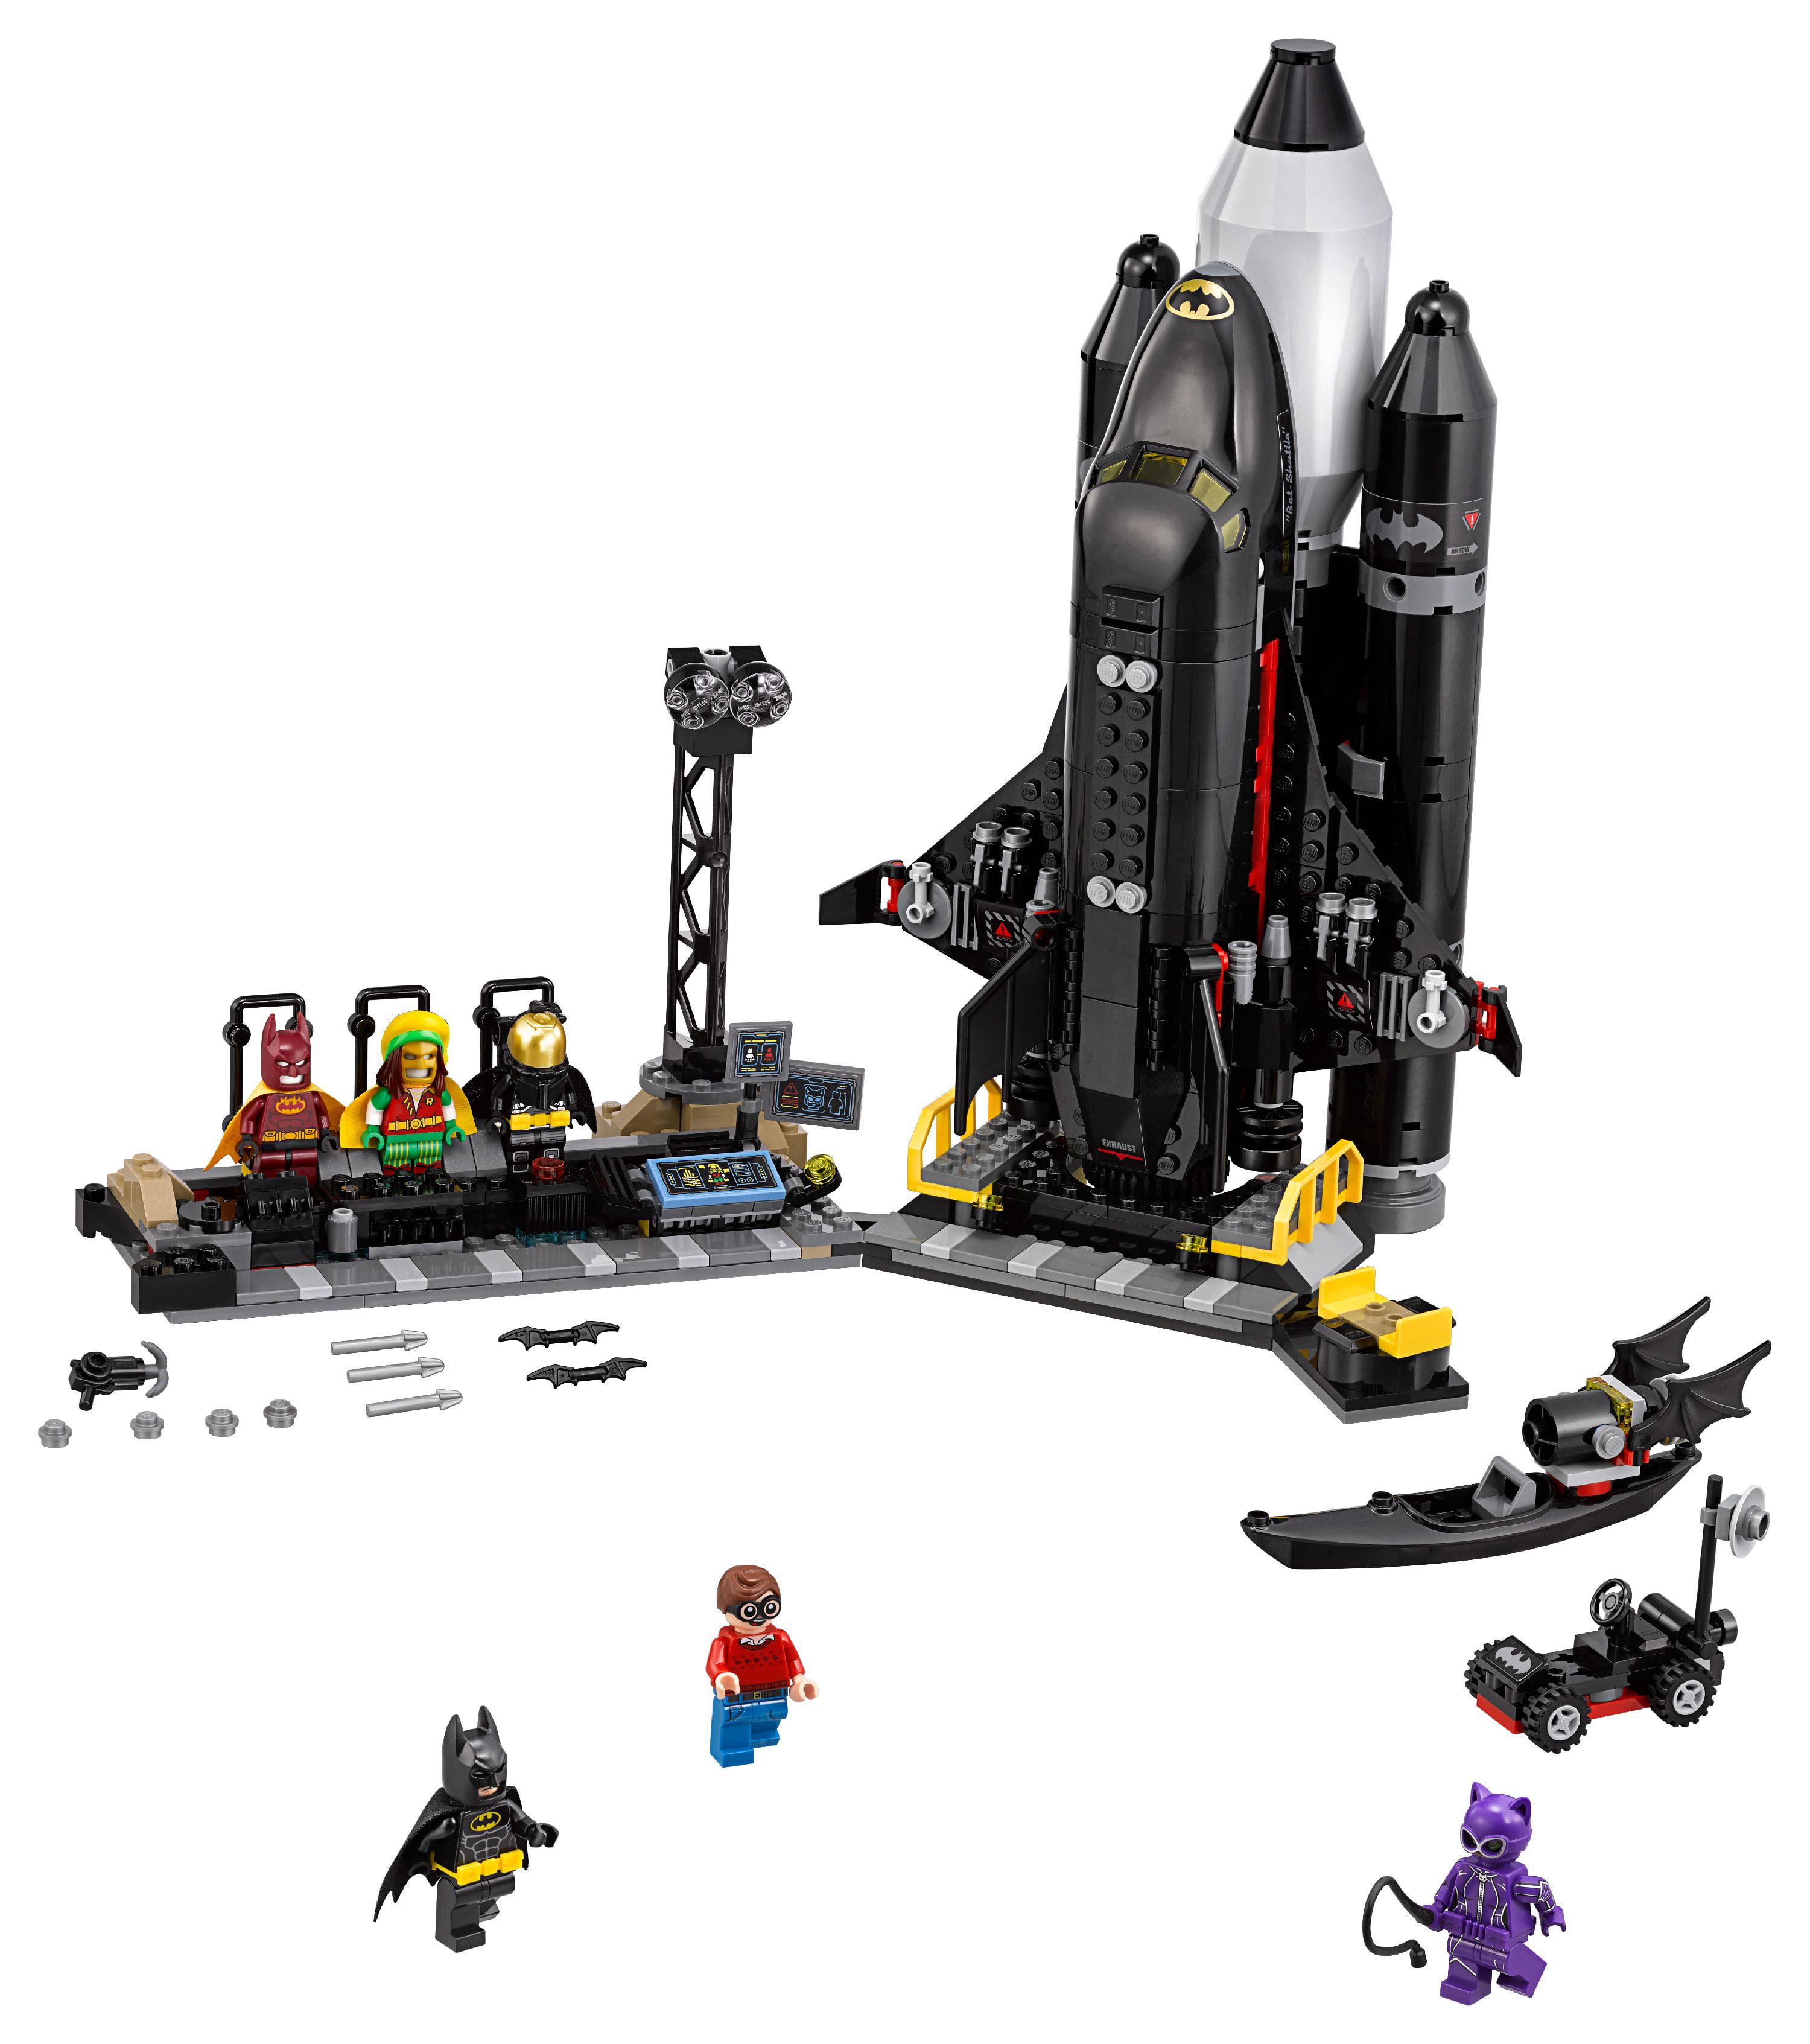 LEGO Batman Movie The Bat-Space Shuttle 70923